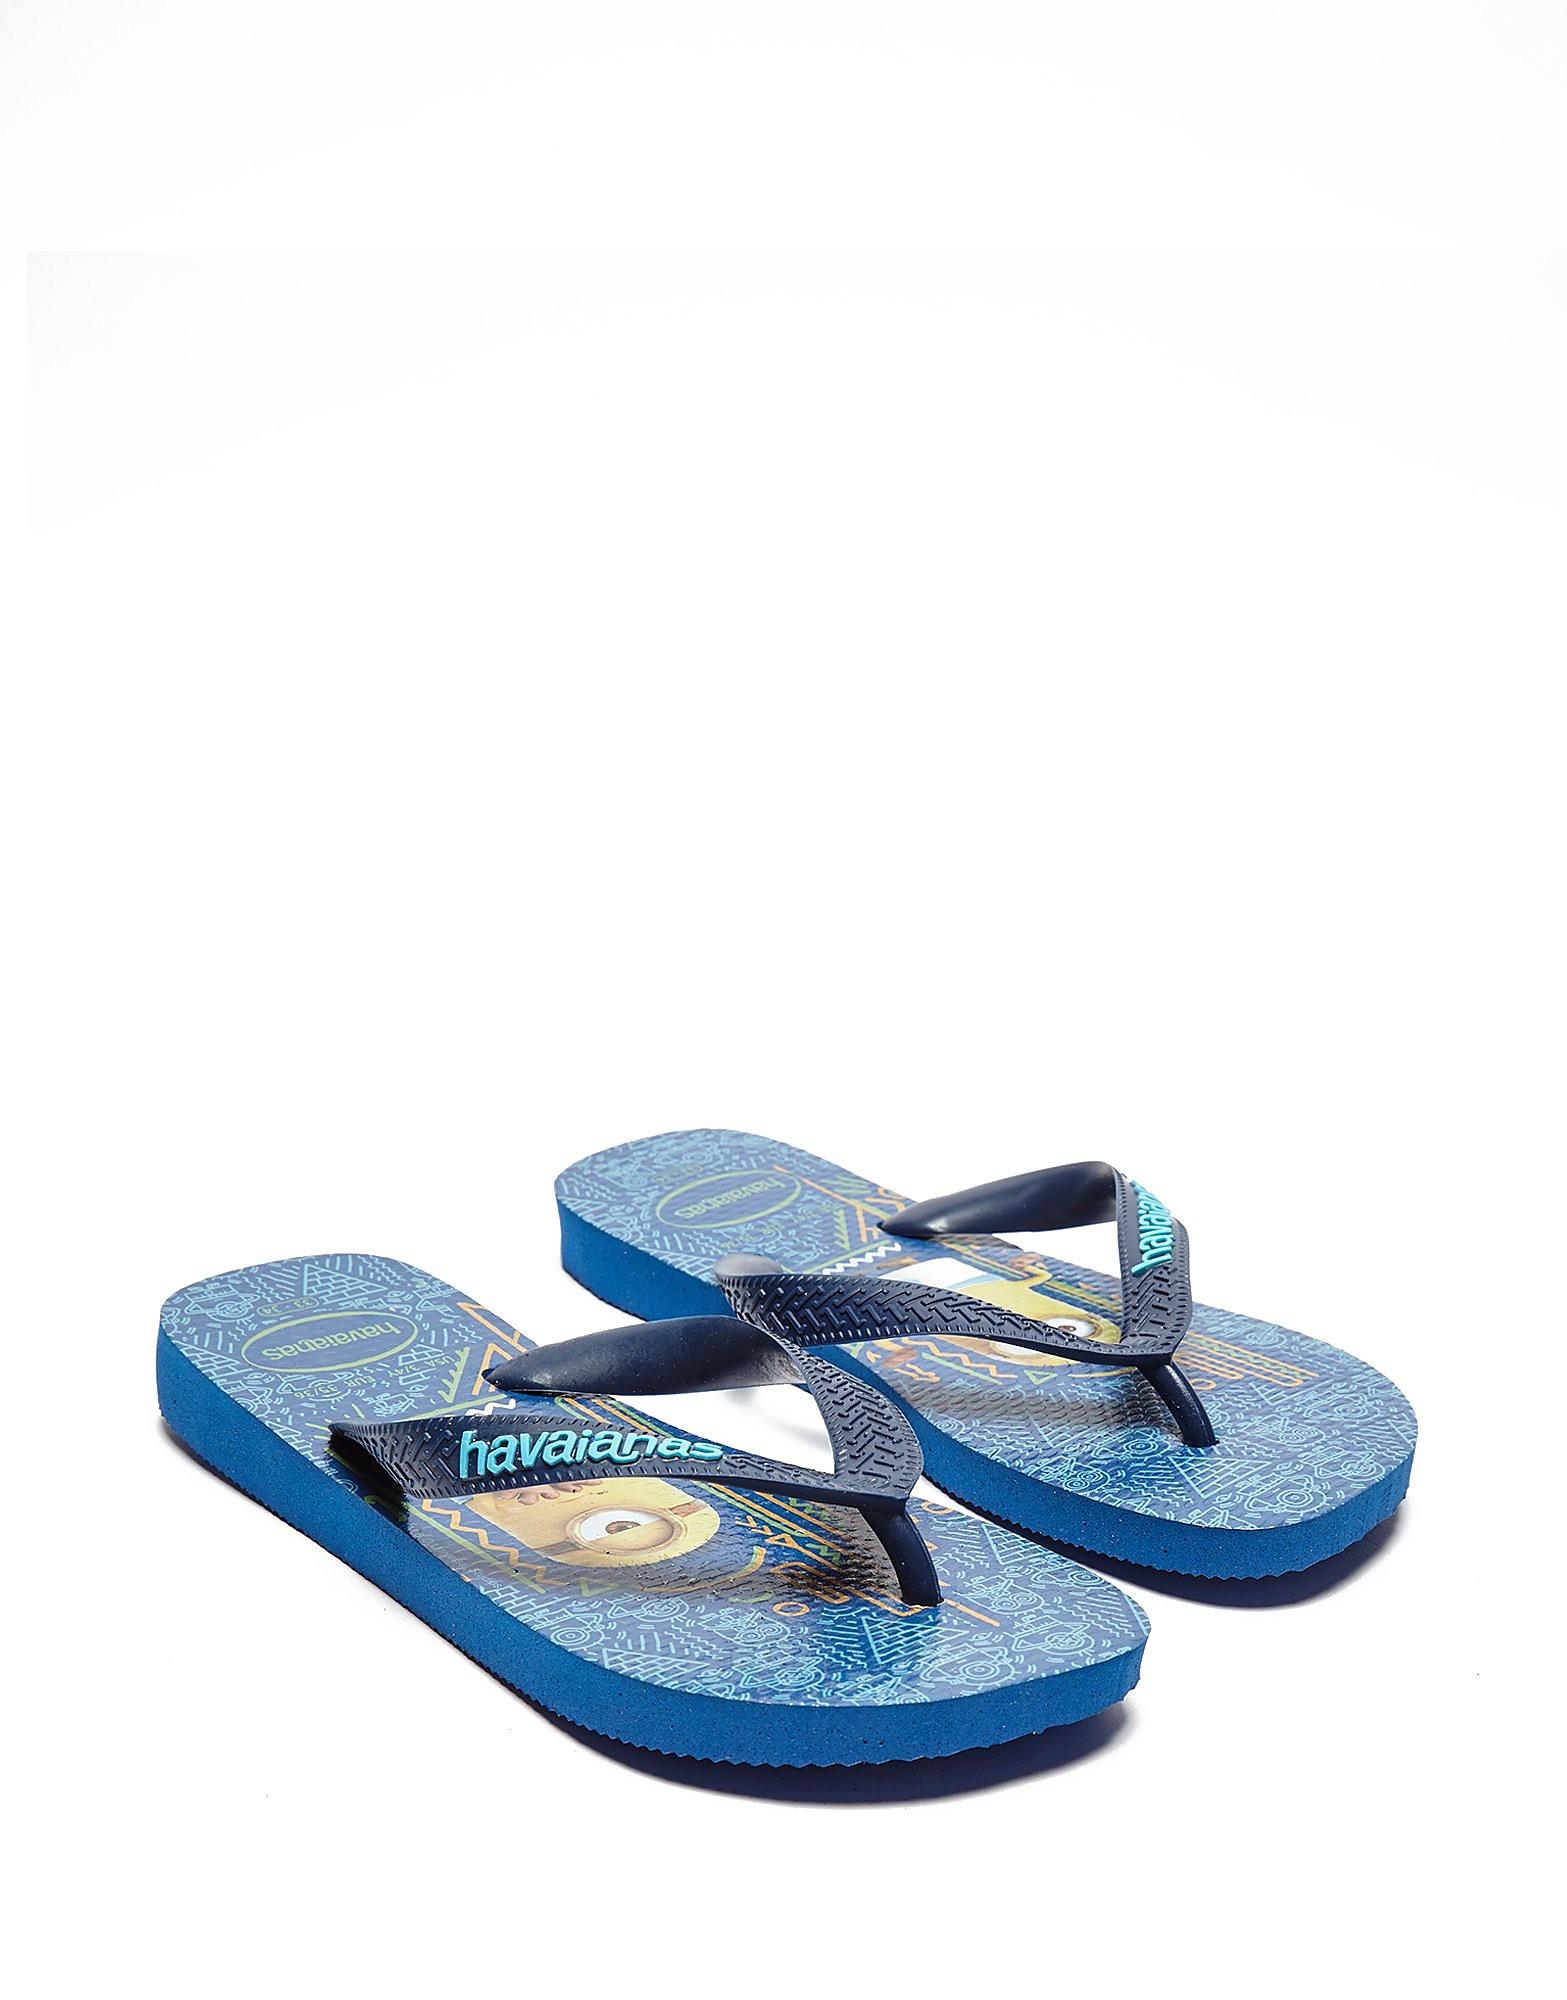 Havaianas Minion Flip Flops